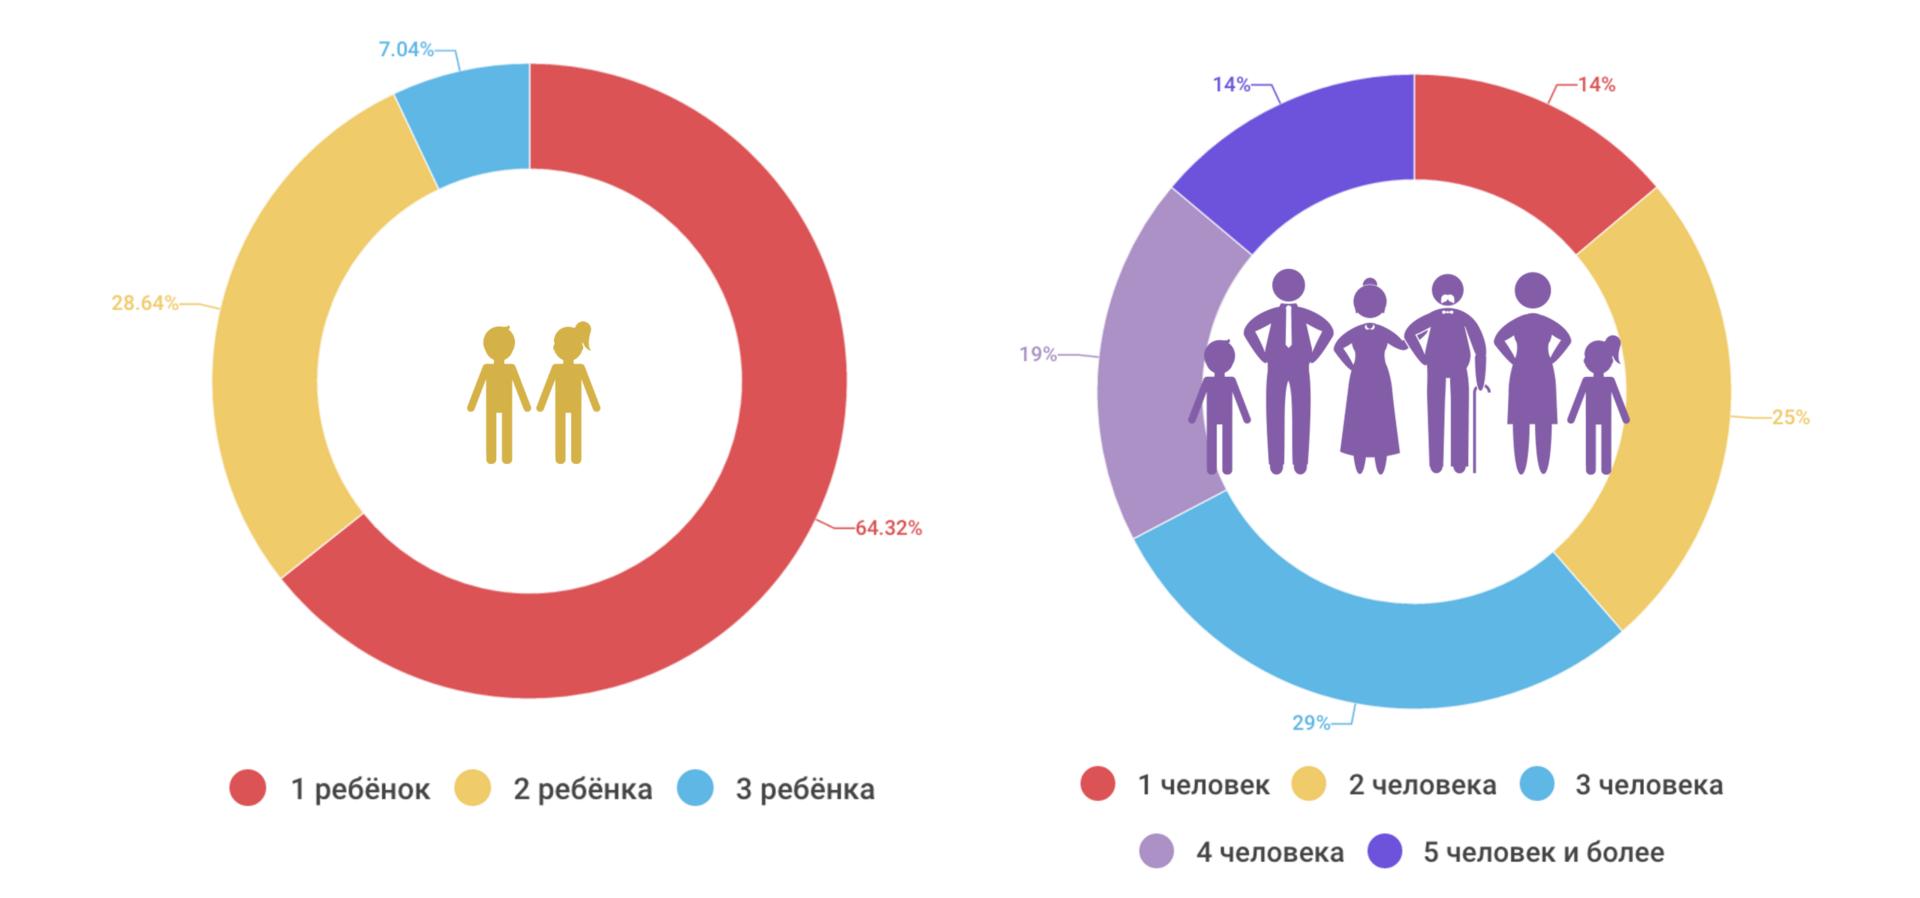 Портрет участника «Дарудара» — инфографика соцопроса - 13